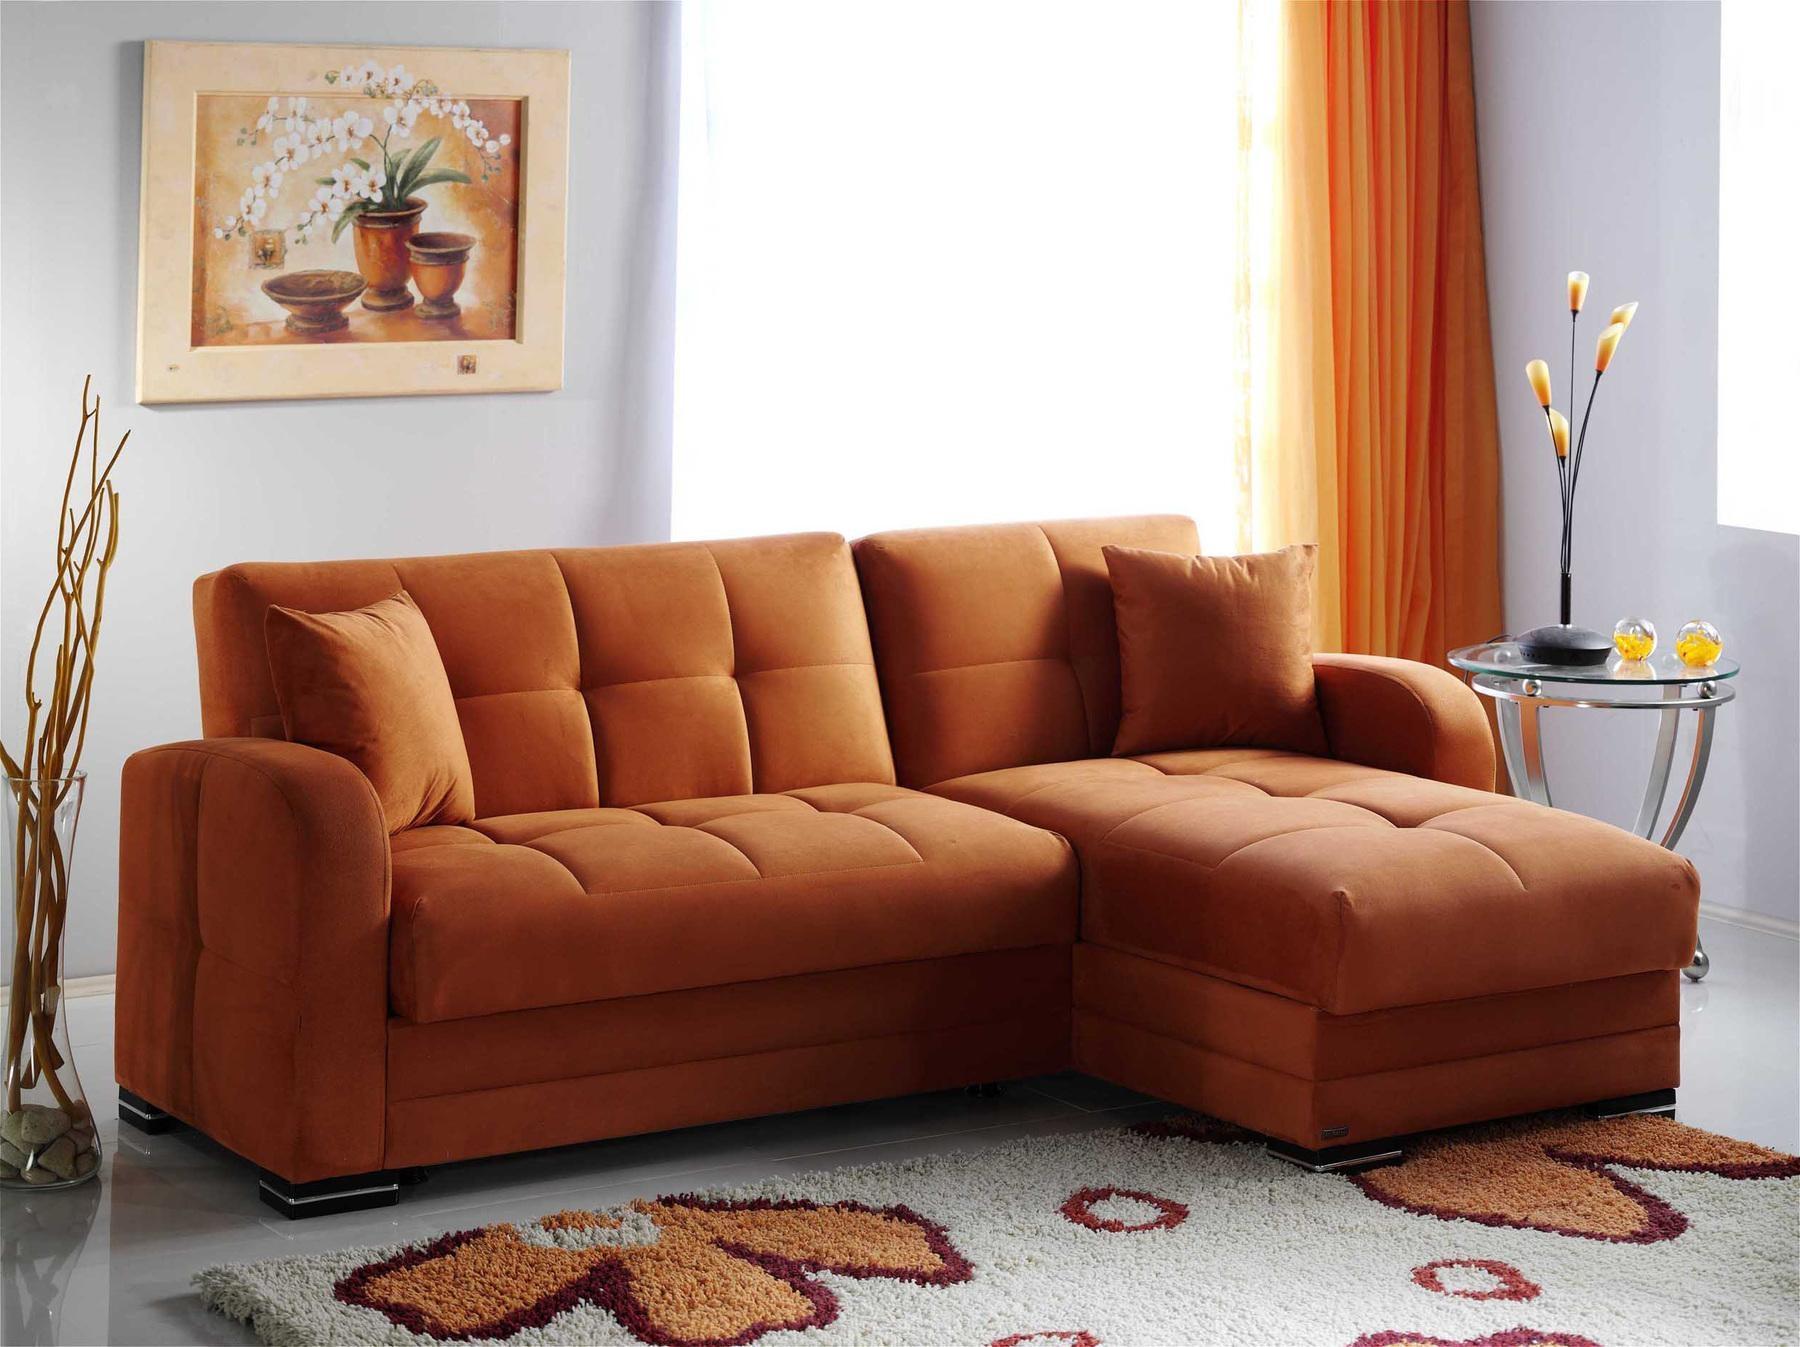 Kubo Orange Rf Sectional Sofa Su-Kubo Sunset Furniture Sectional for Window Sofas